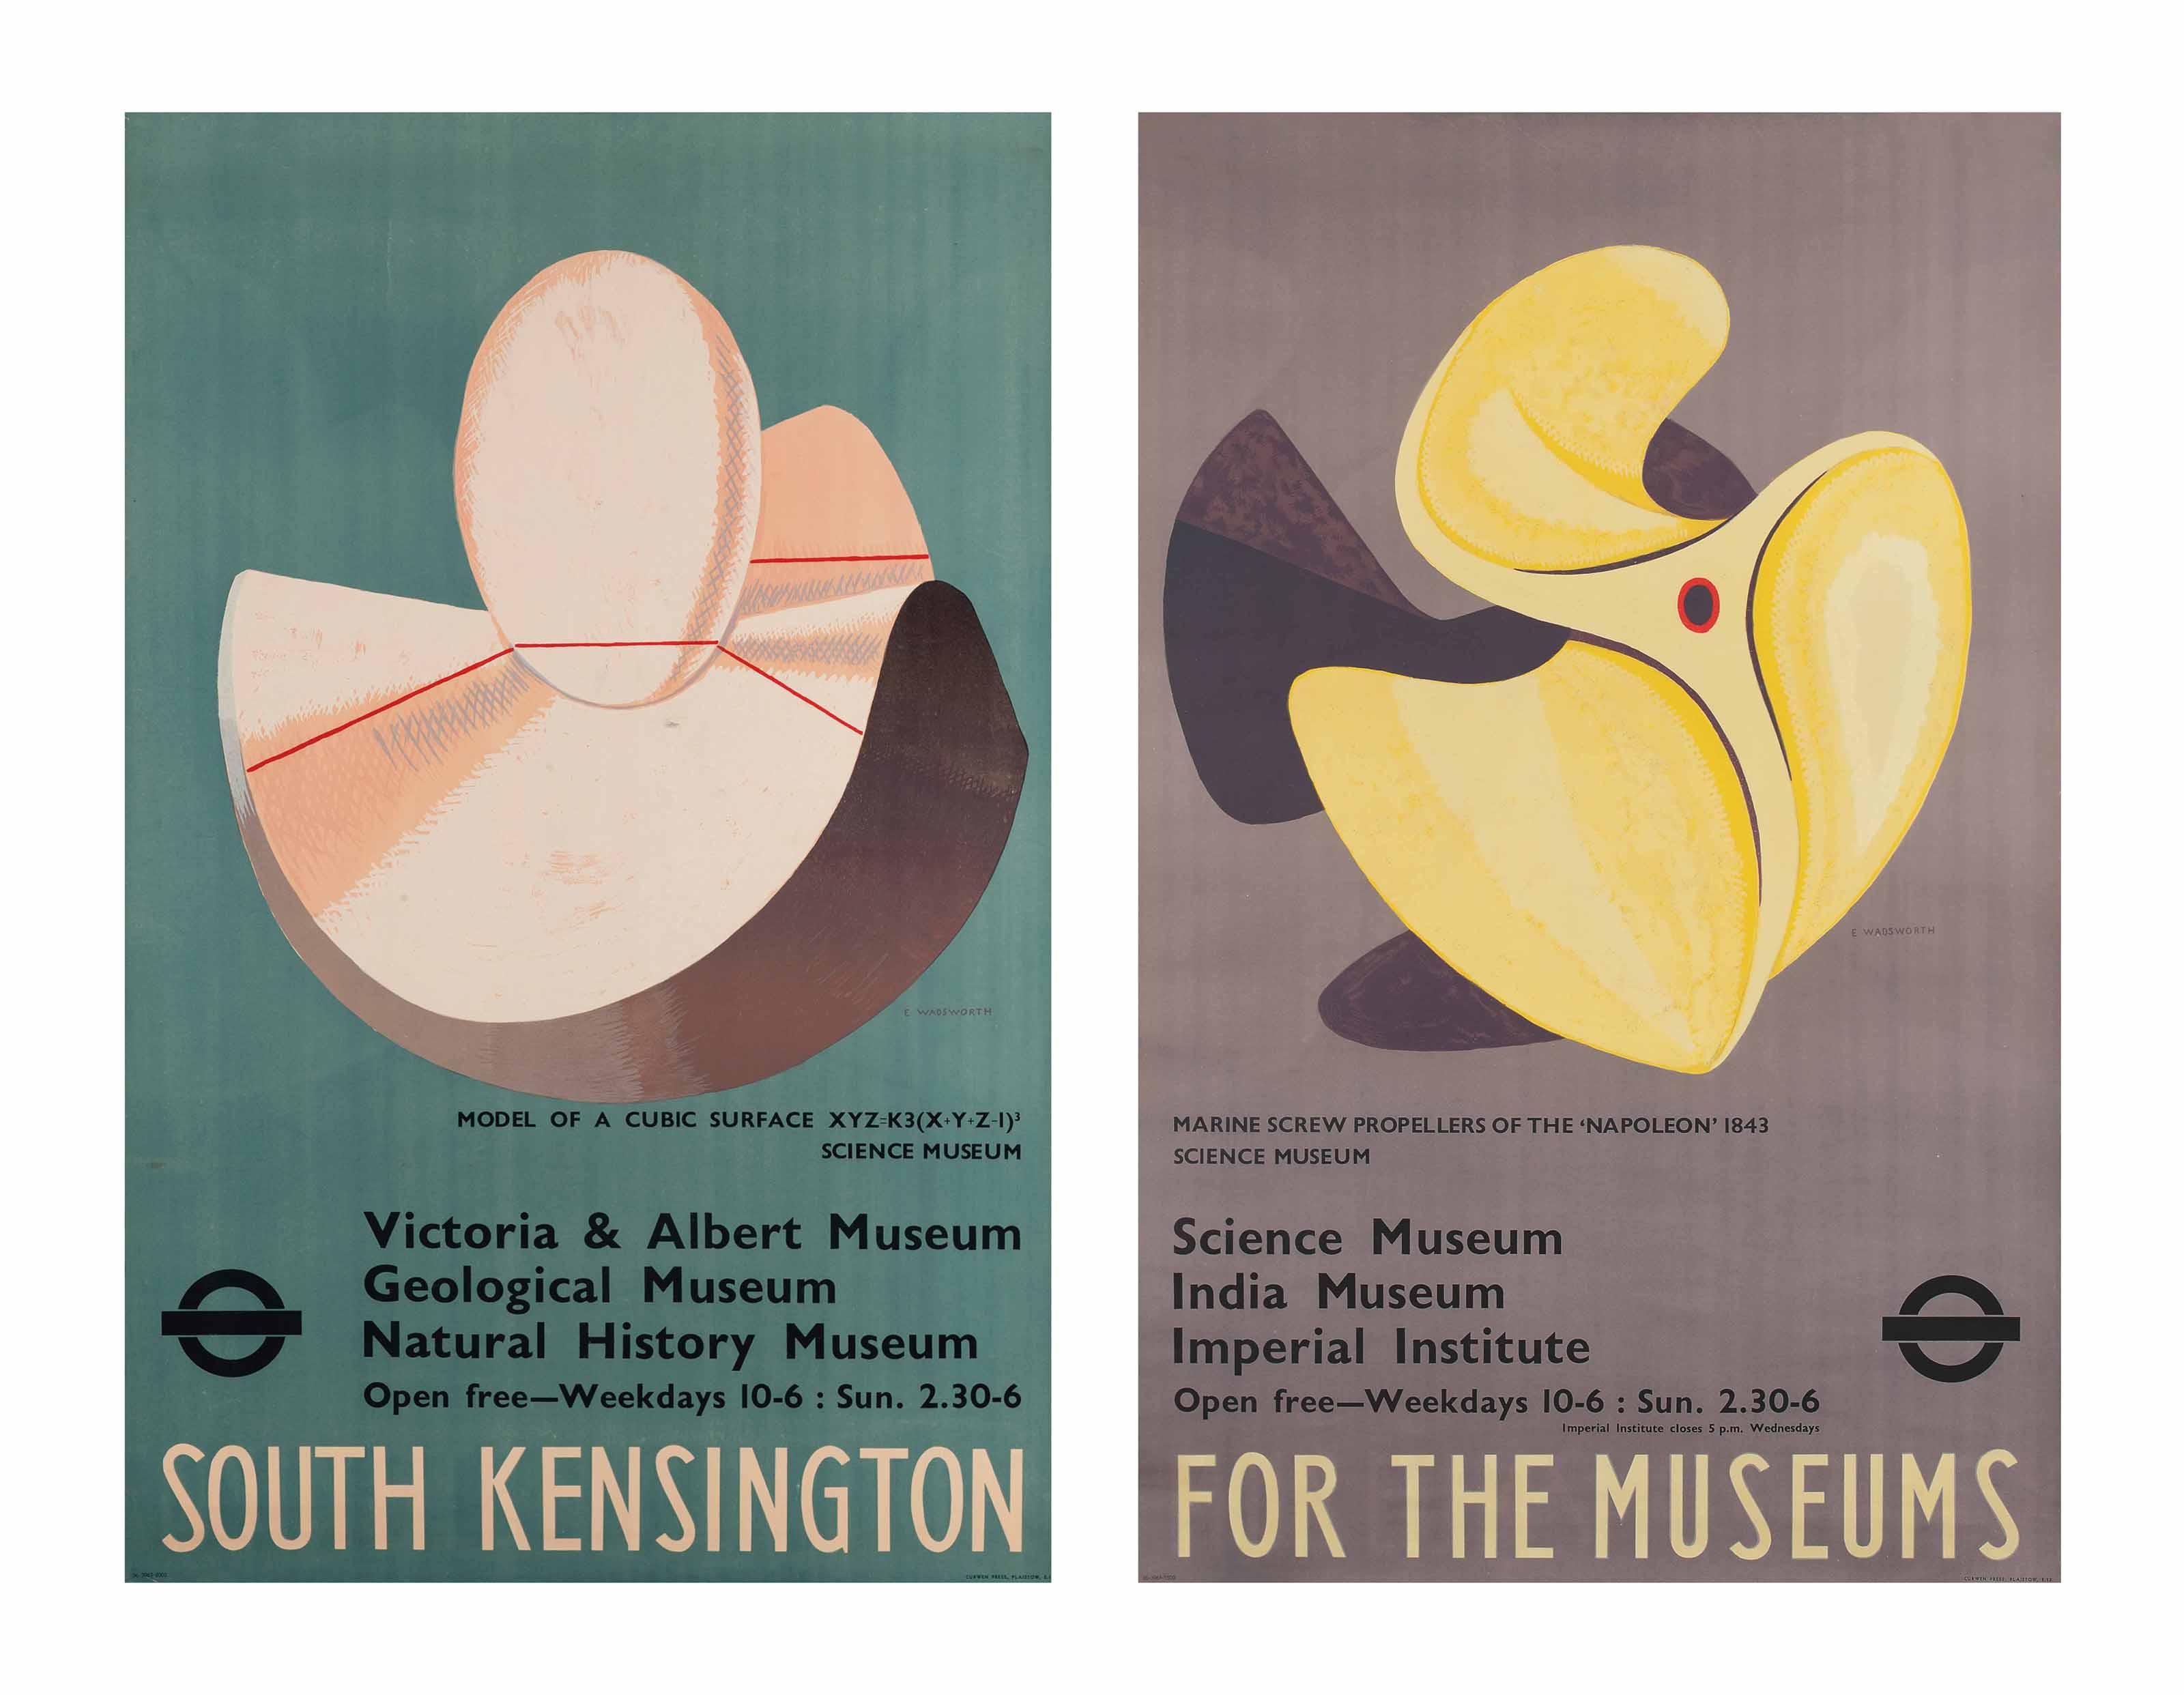 SOUTH KENSINGTON MUSEUMS